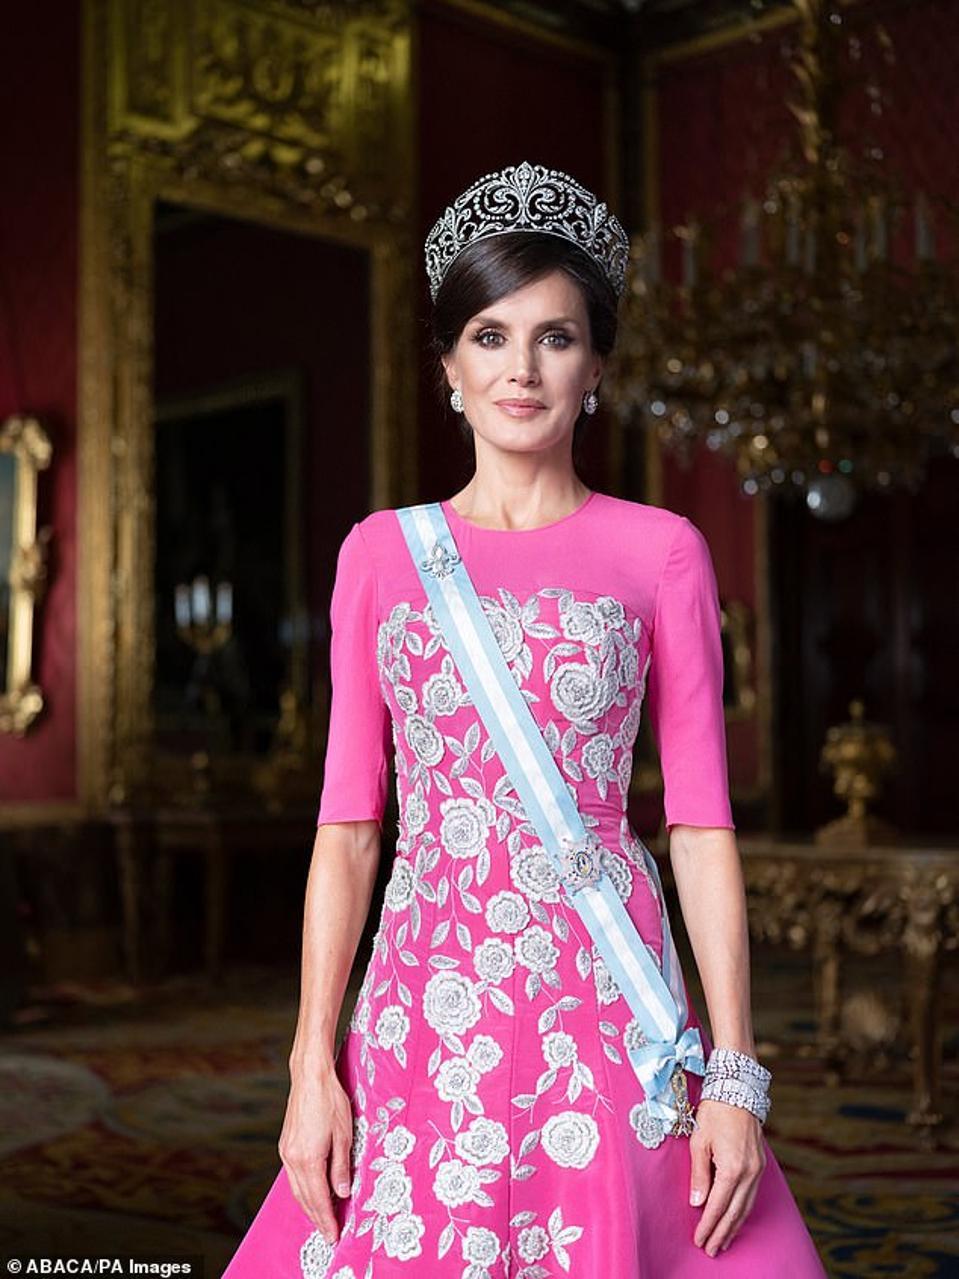 New glamorous portrait of Queen Letizia of Spain